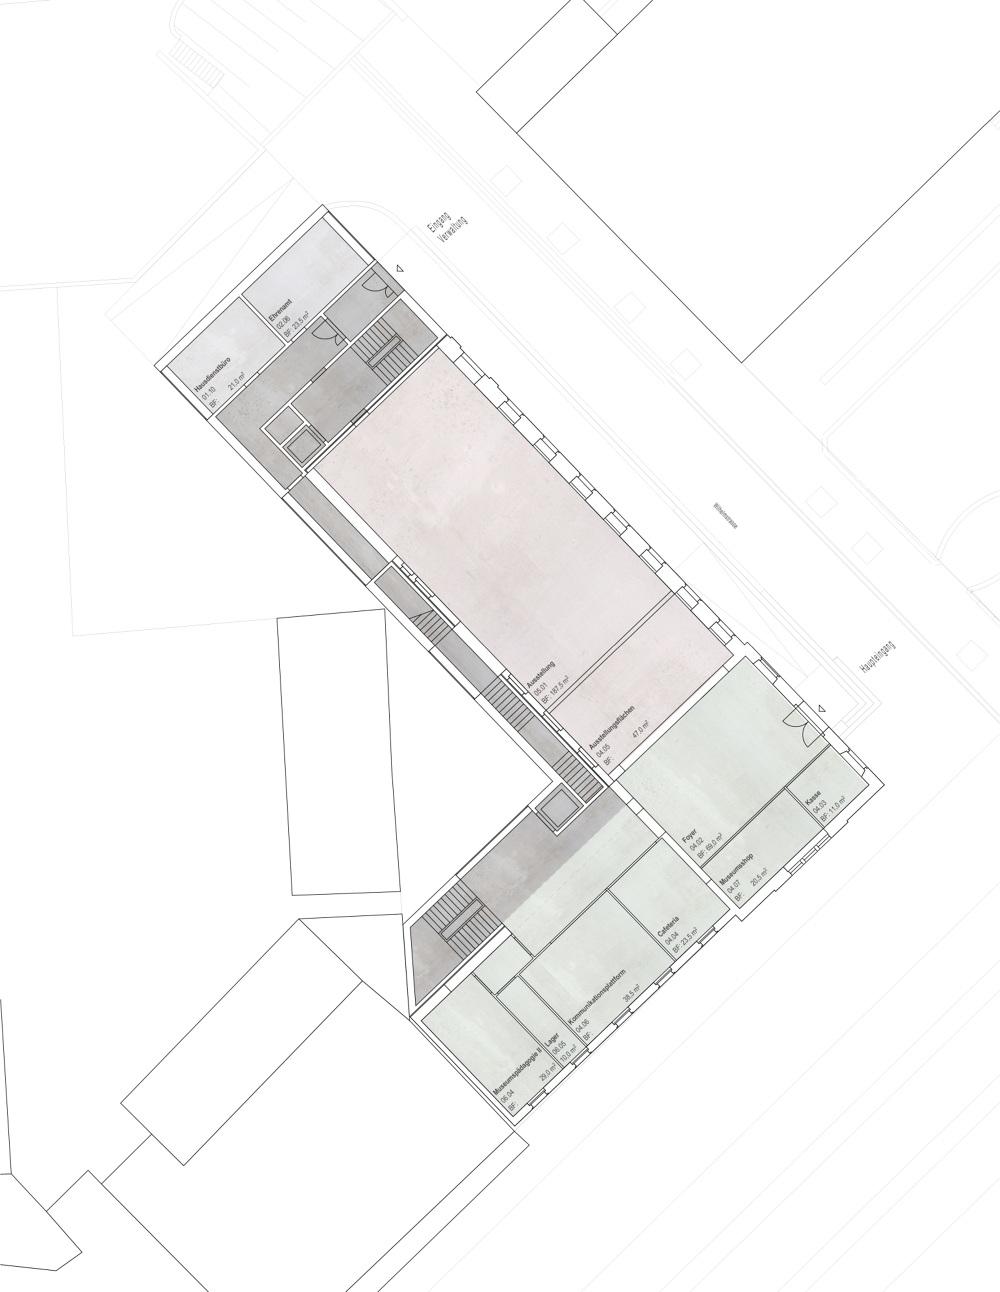 stadtmuseum kassel roland unterbusch architekt rostock. Black Bedroom Furniture Sets. Home Design Ideas